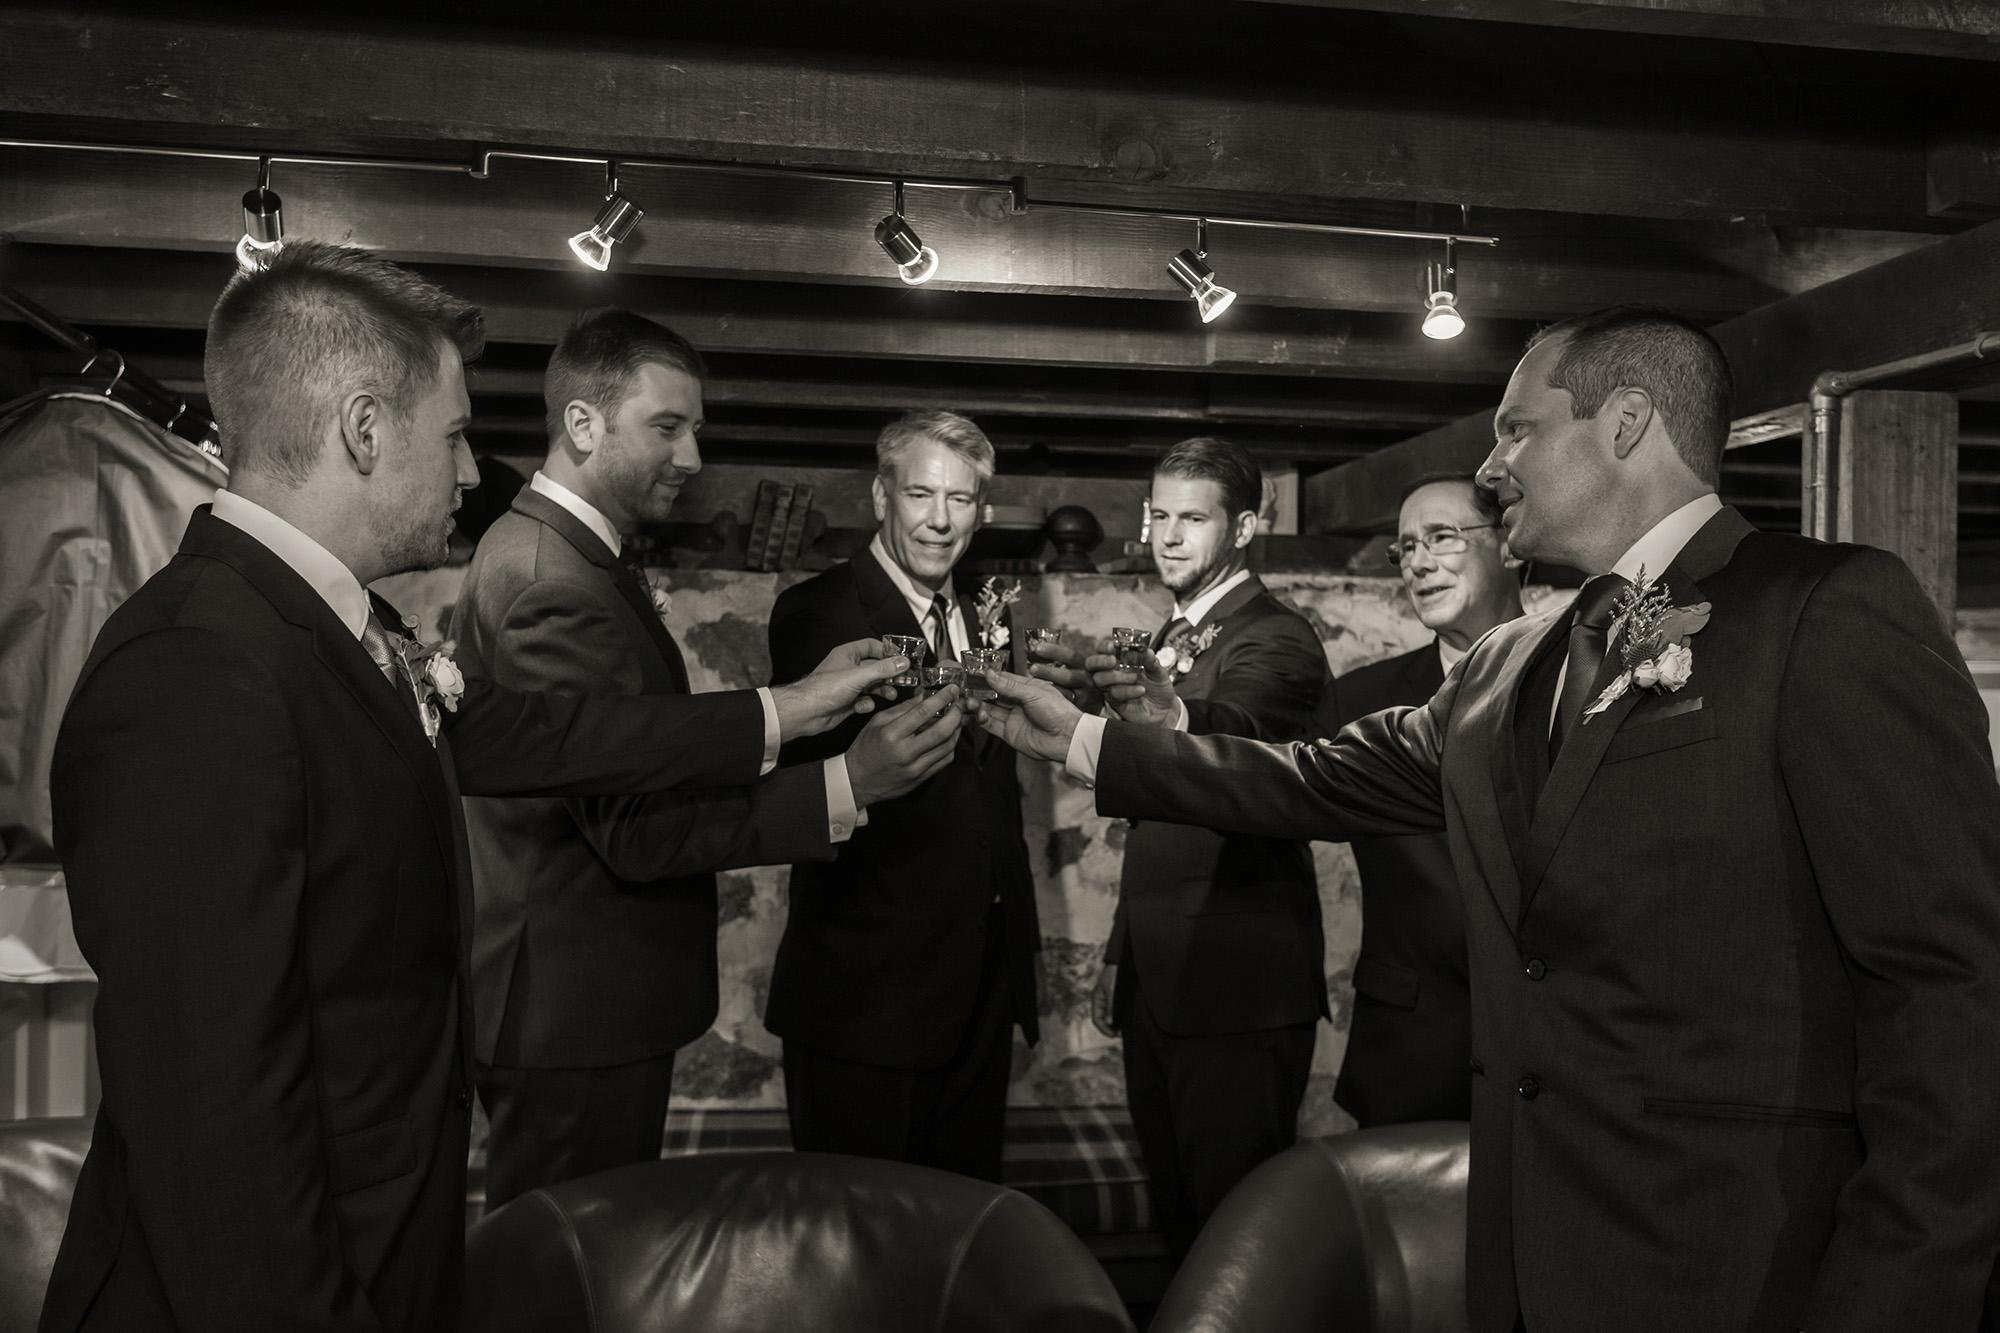 associate-photographer-christmas-house-wedding-carrie-vines-0019.jpg